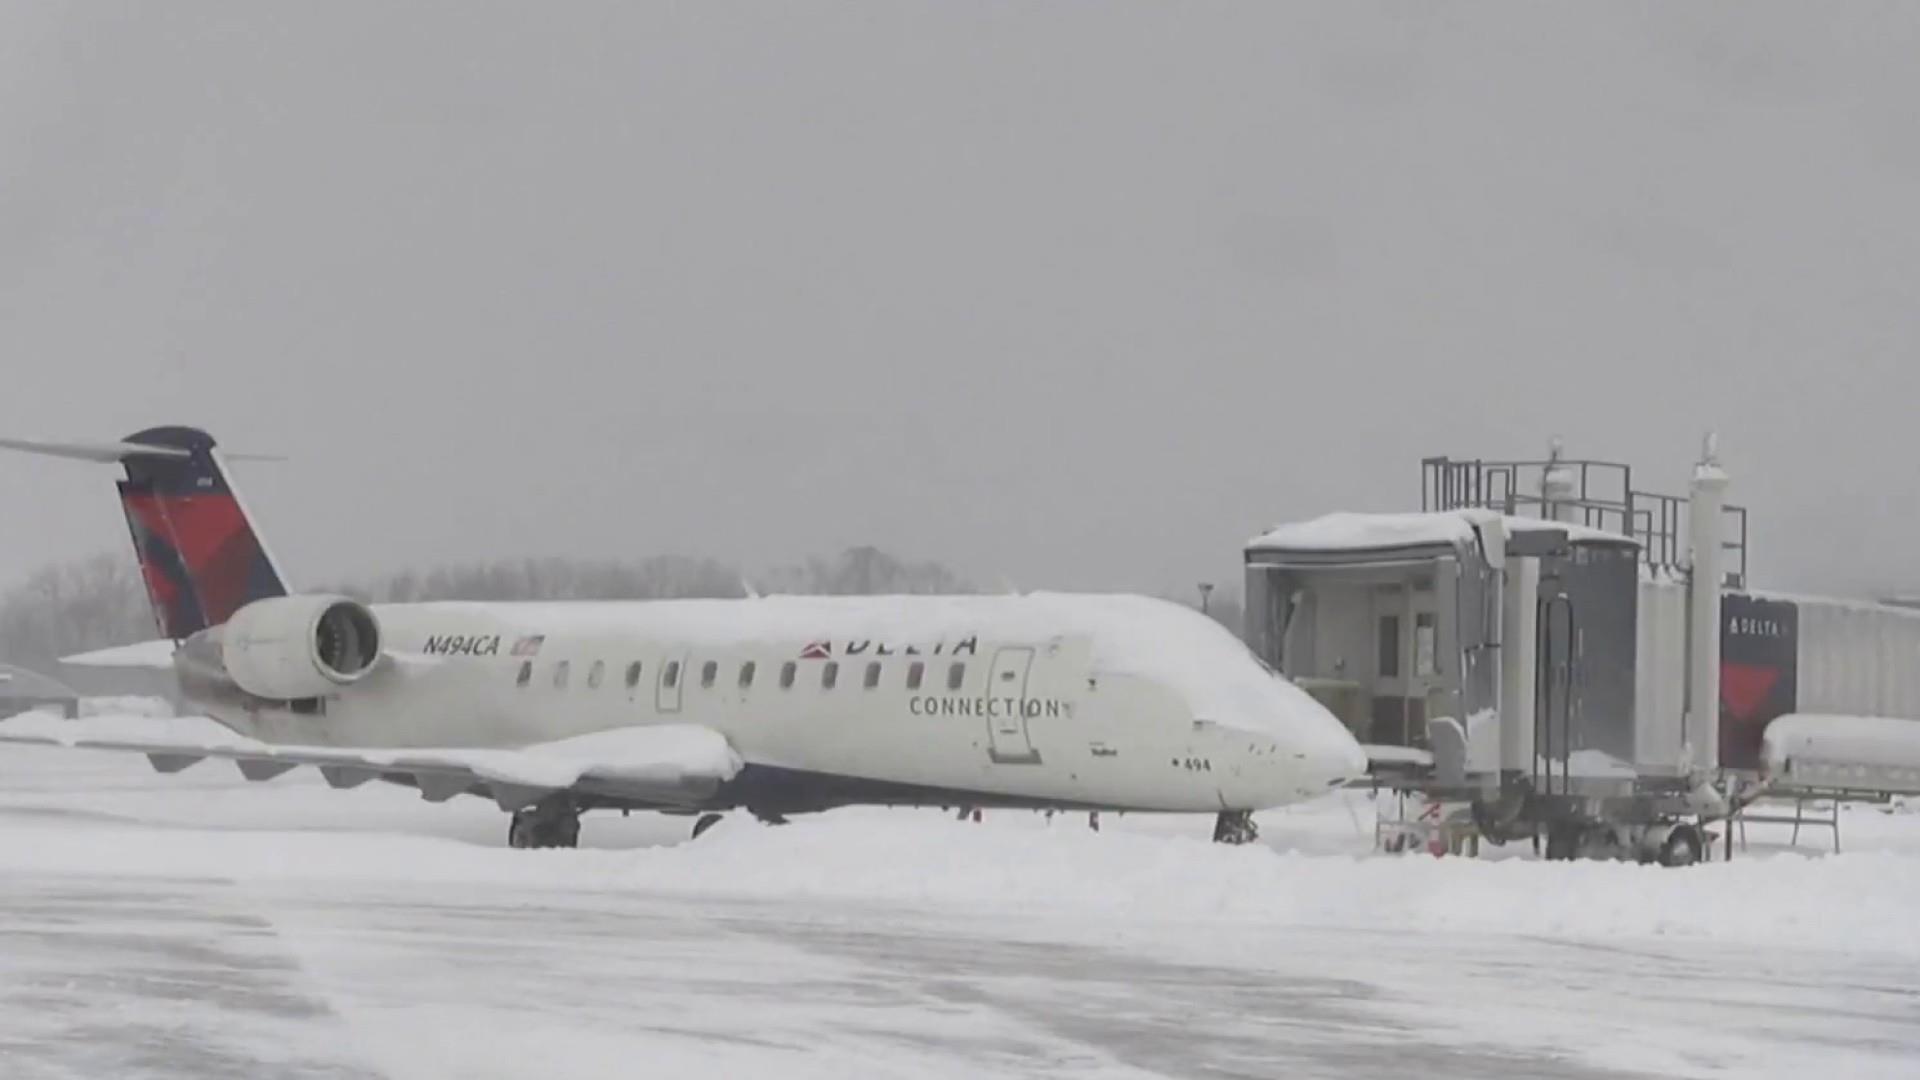 Record-breaking snowstorm in Pennsylvania declared disaster emergency